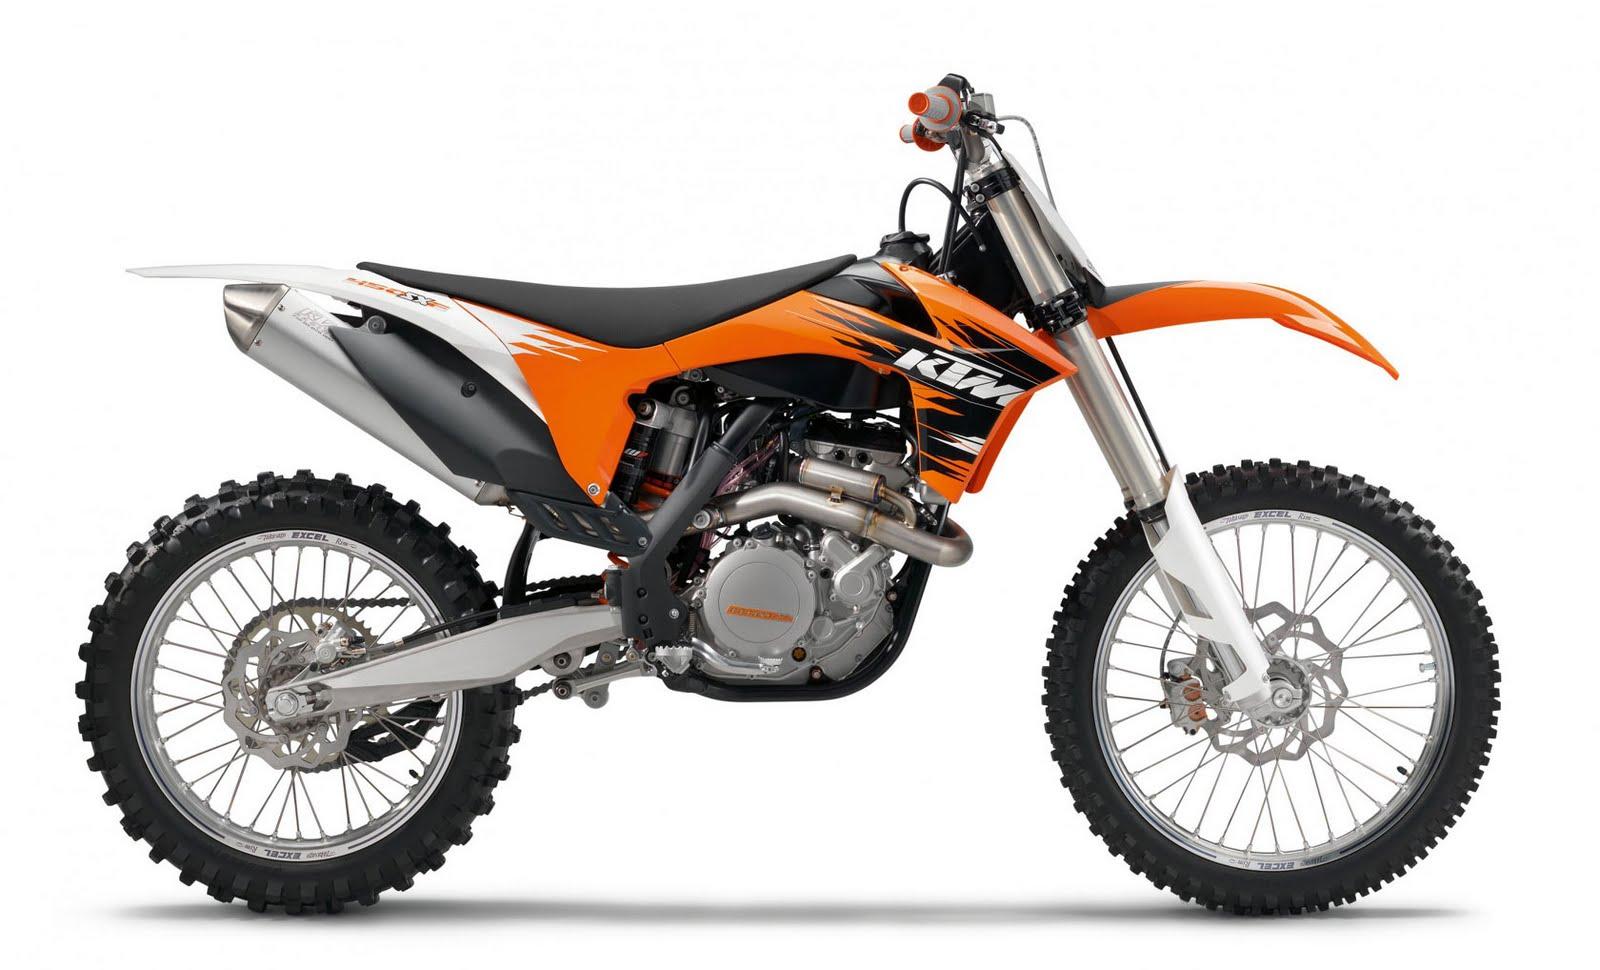 motorcycle pictures ktm 450 sx f 2011. Black Bedroom Furniture Sets. Home Design Ideas